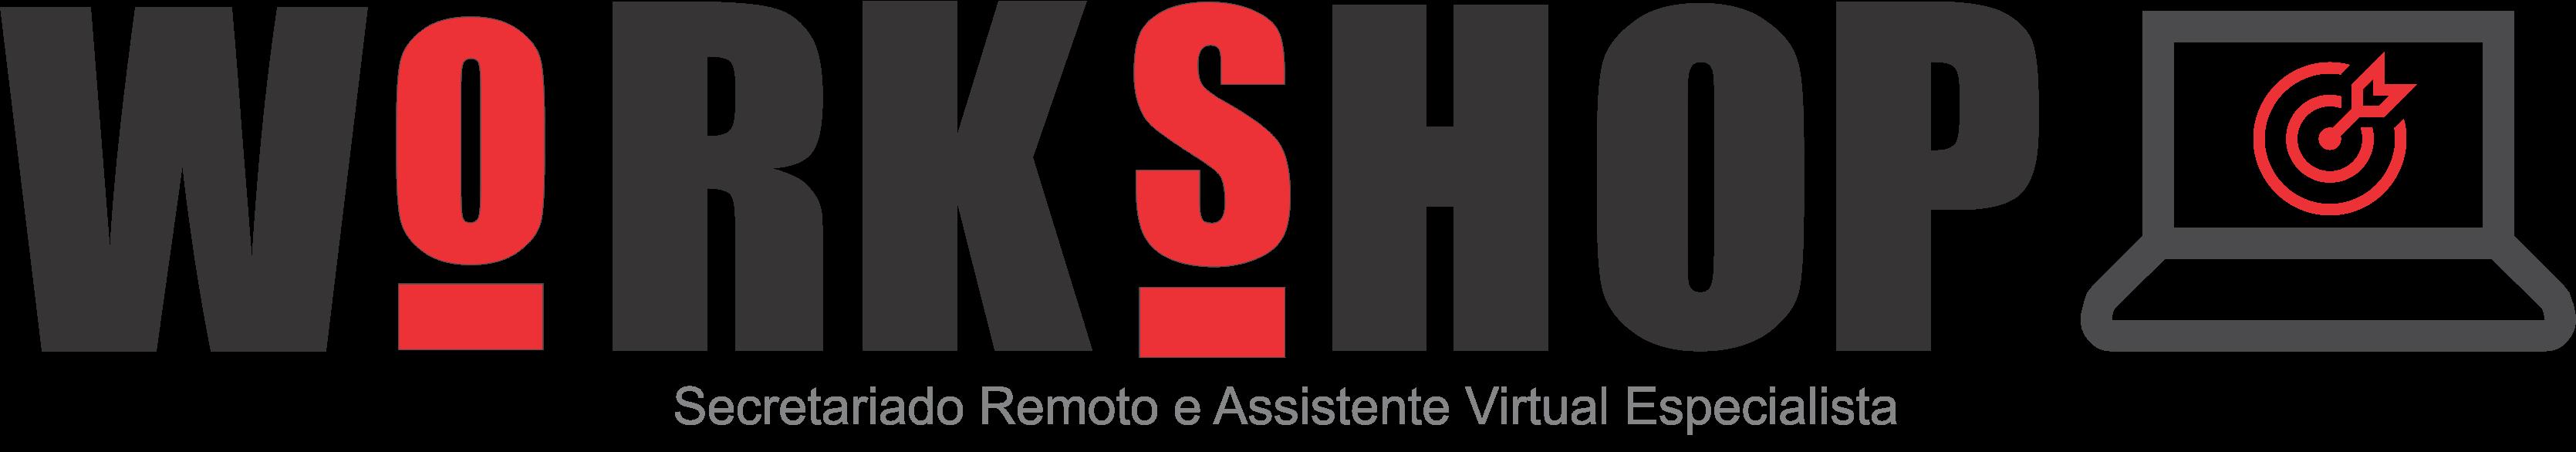 2º Workshop Secretariado Remoto e Assistente Virtual Especialista